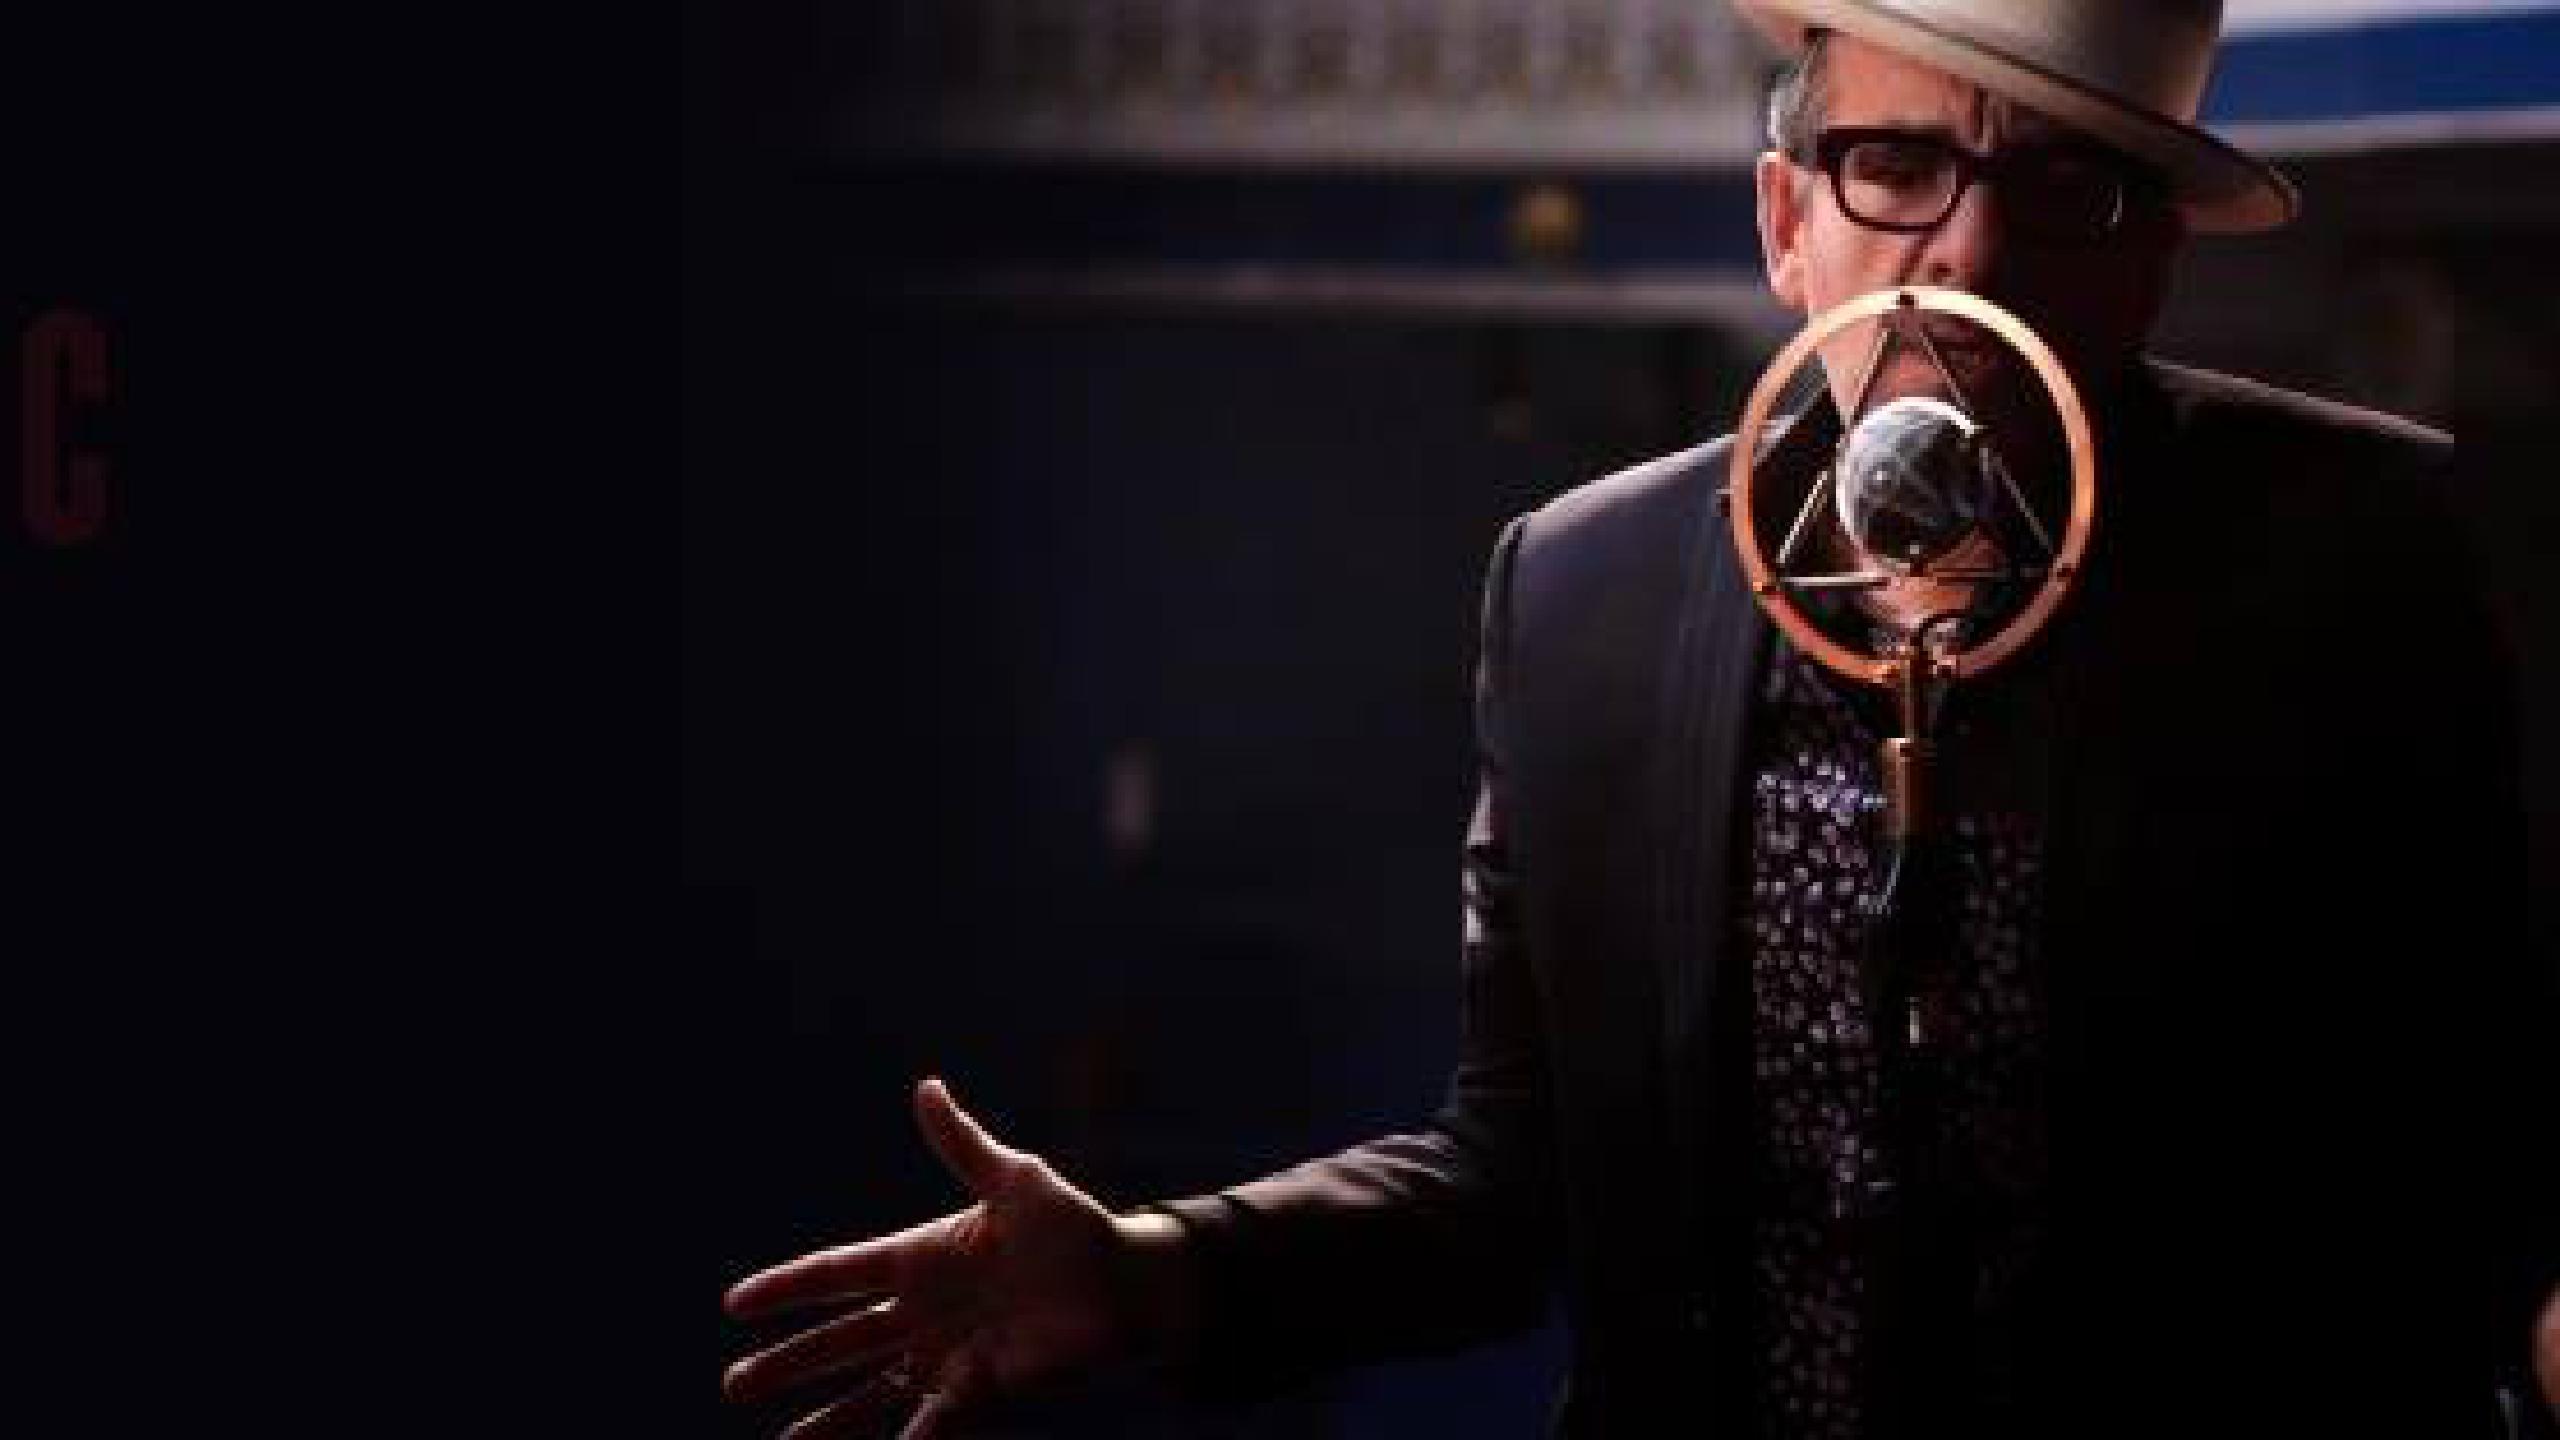 Elvis Costello Tour 2020 Elvis Costello tour dates 2019 2020. Elvis Costello tickets and